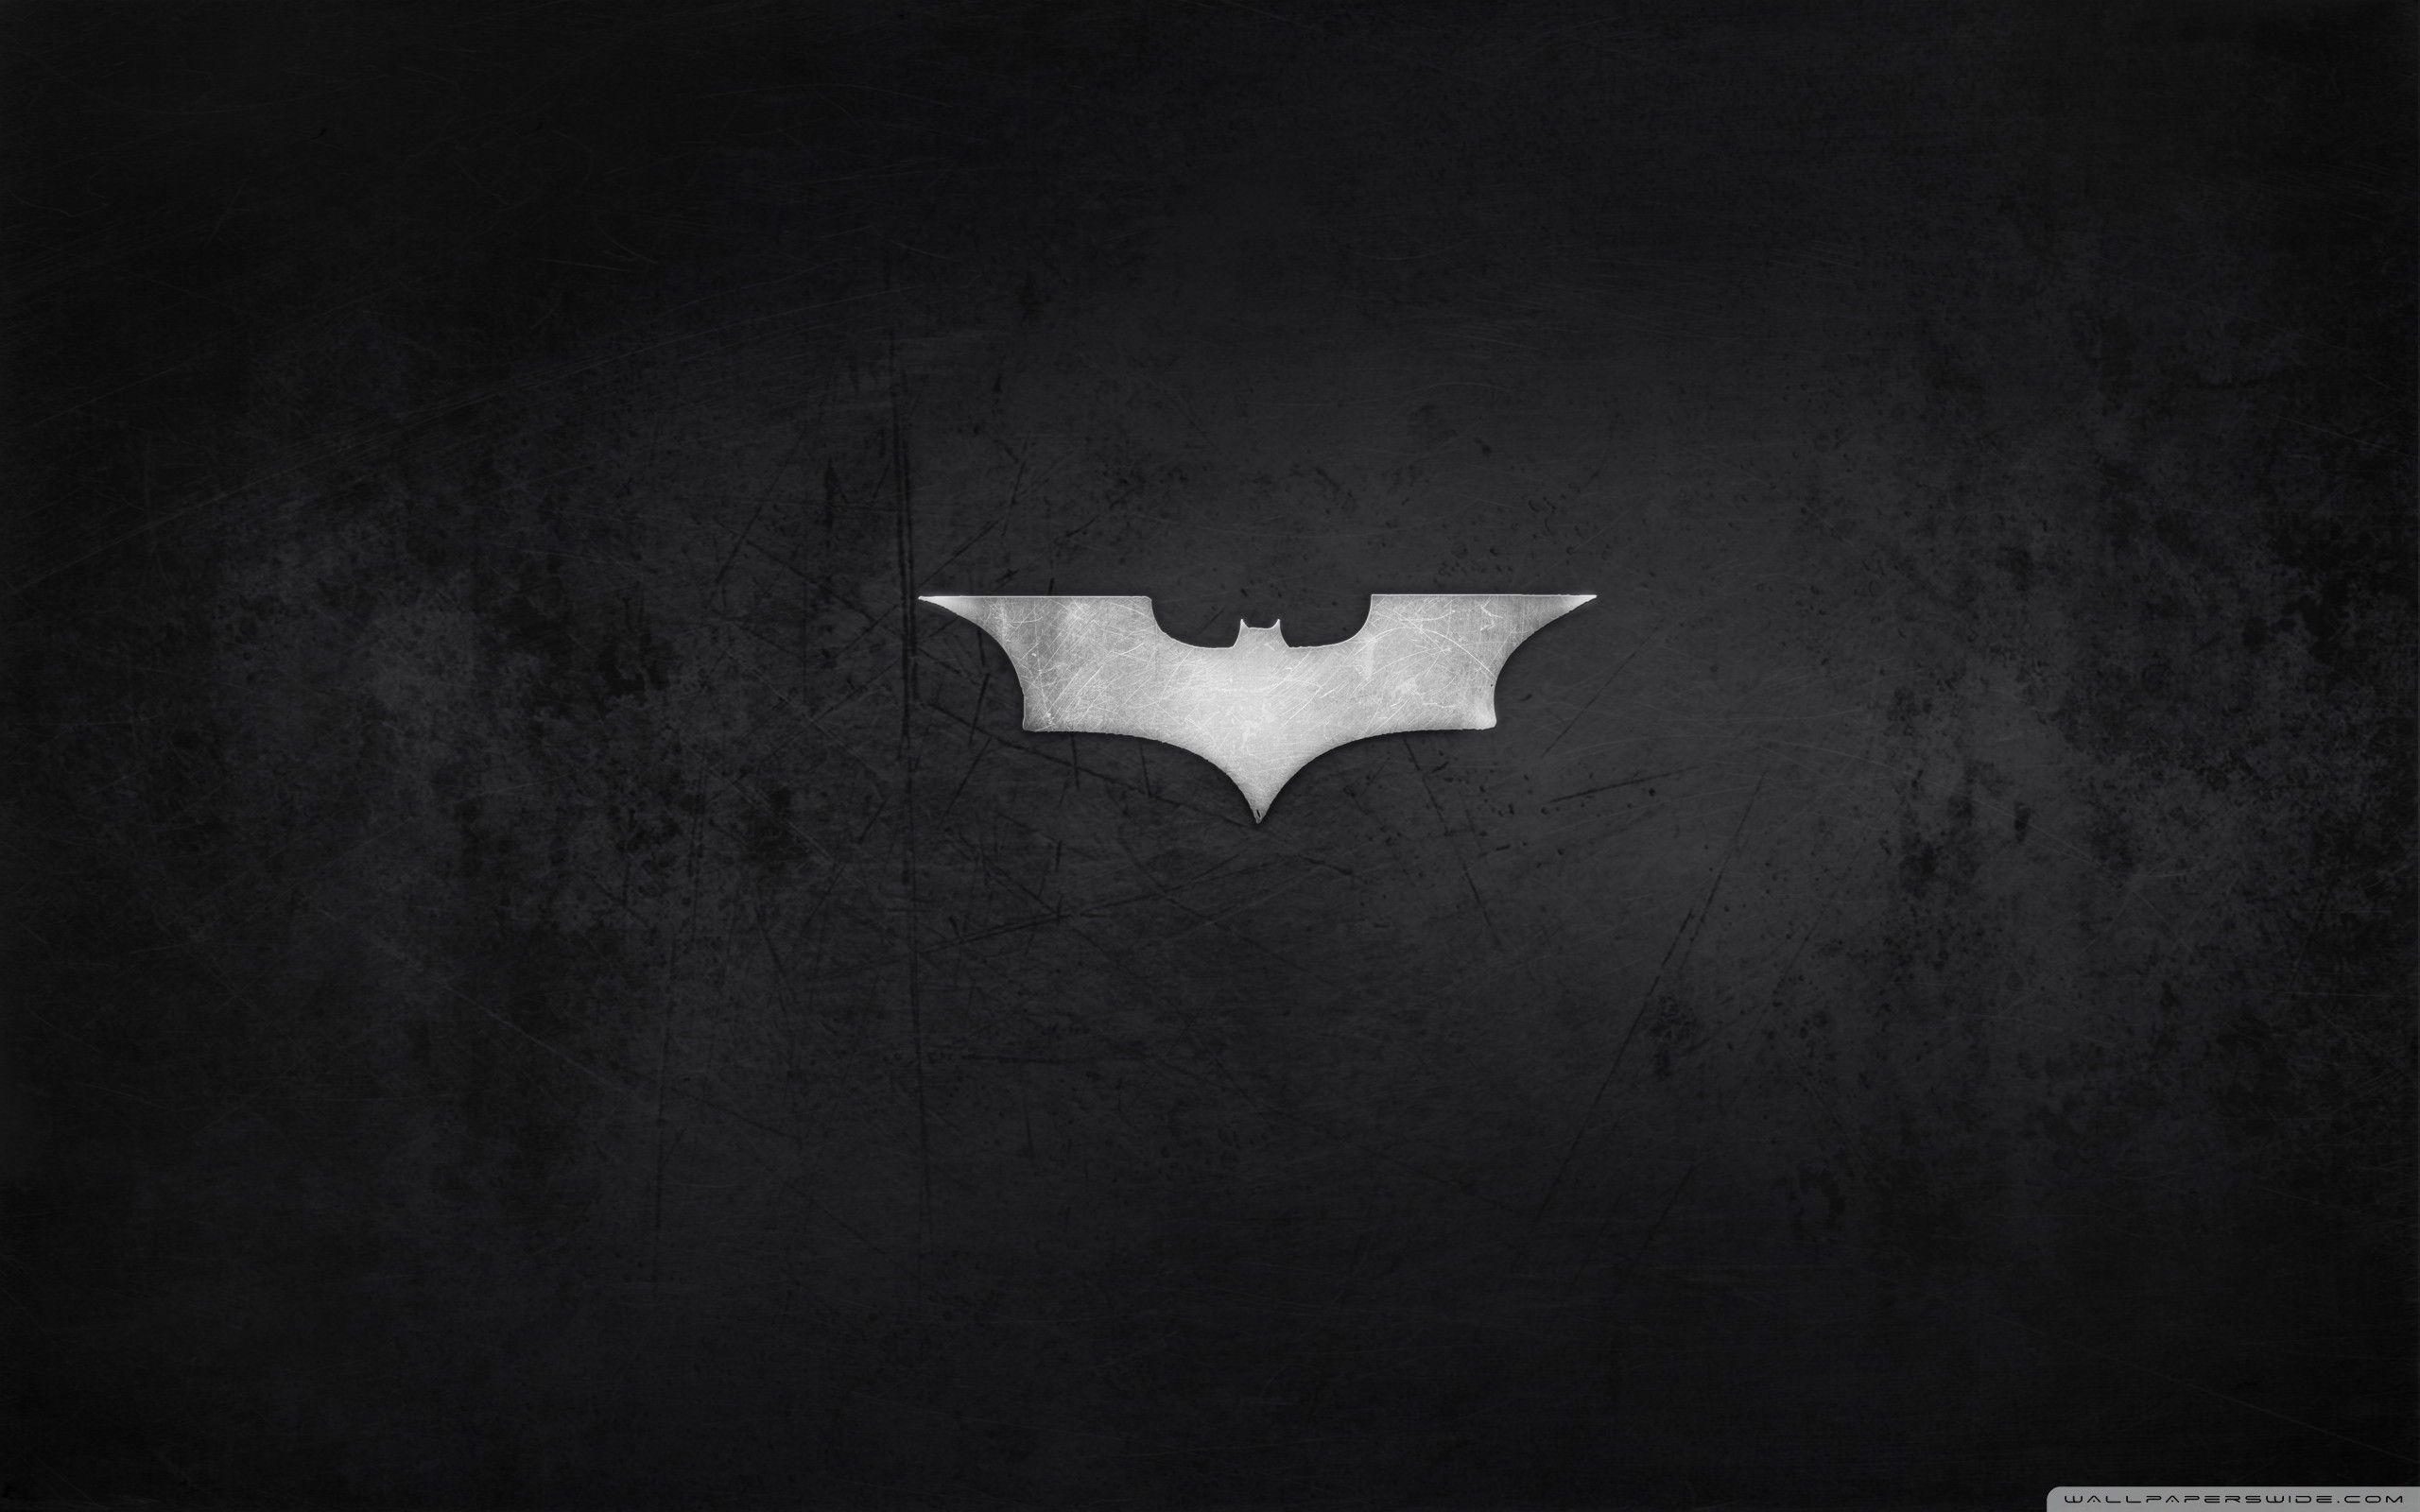 Lovely Batman Logo Hd Wallpaper Batman Wallpaper Batman Backgrounds 4k Wallpapers For Pc